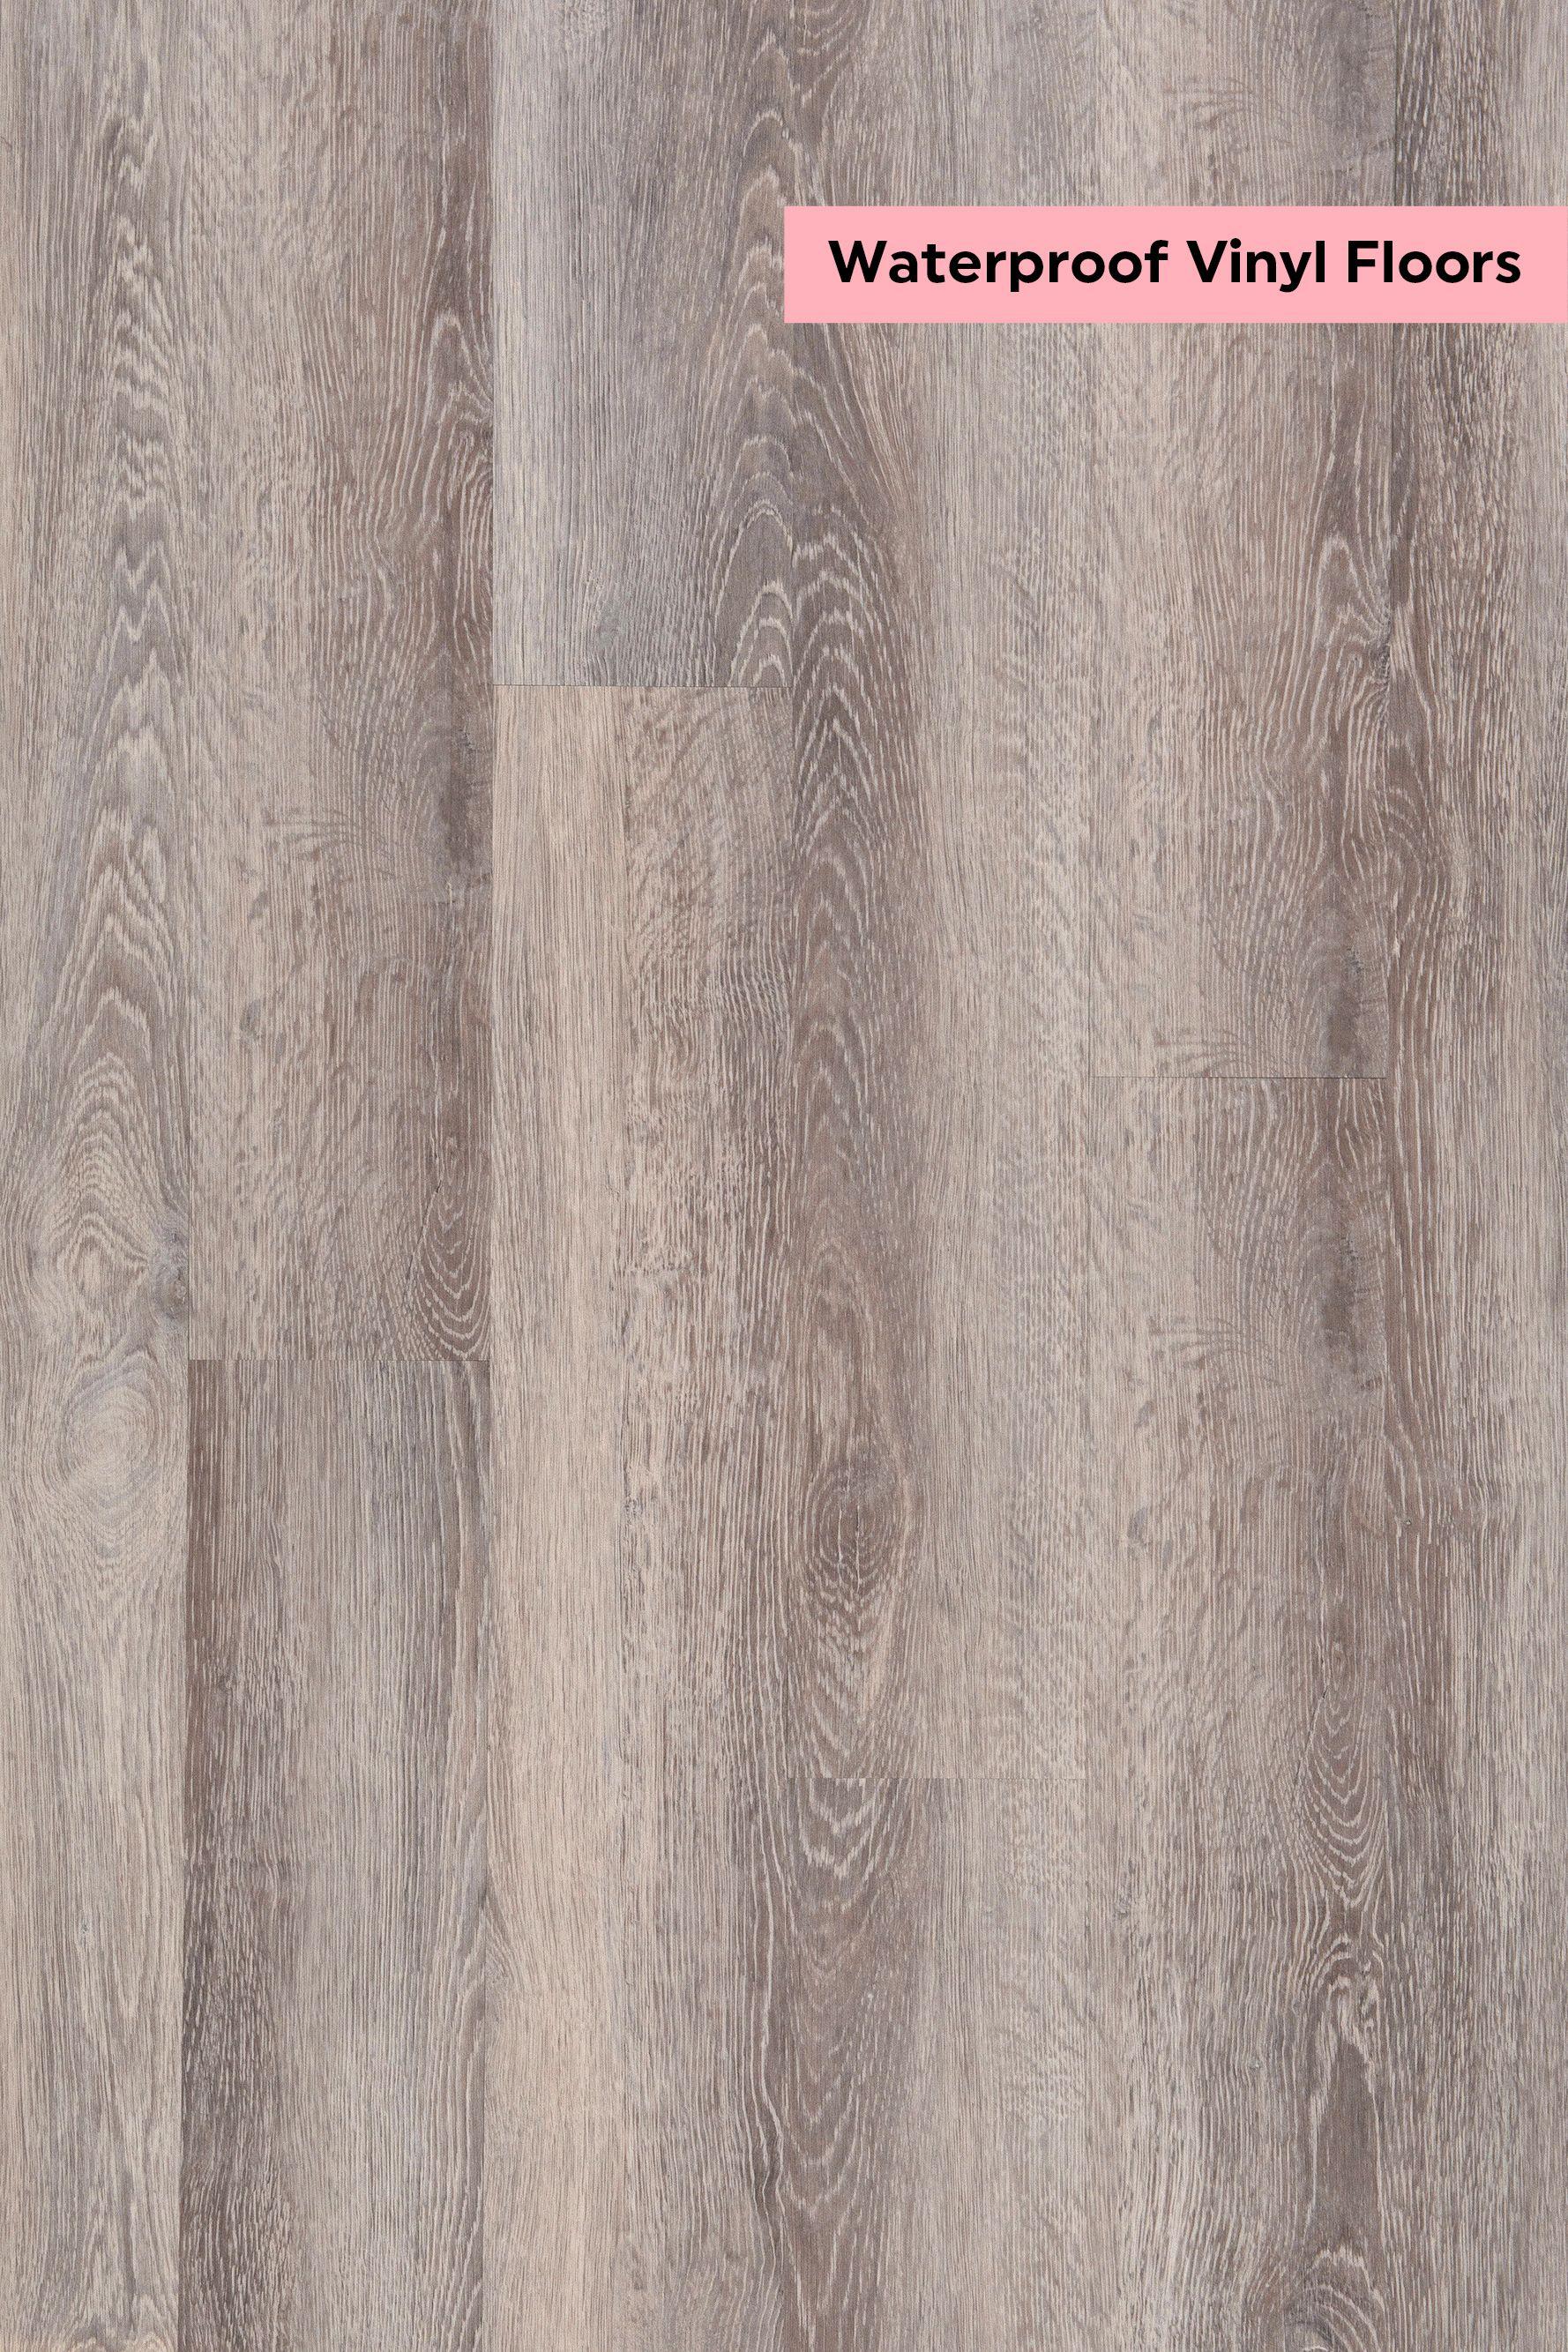 Luxury Vinyl Wood Planks Peel And Stick Tile Floor Tile Stickers Grey Wood Floors Wall Paneling Chateau Oak In 2020 Vinyl Wood Planks Vinyl Flooring Luxury Vinyl